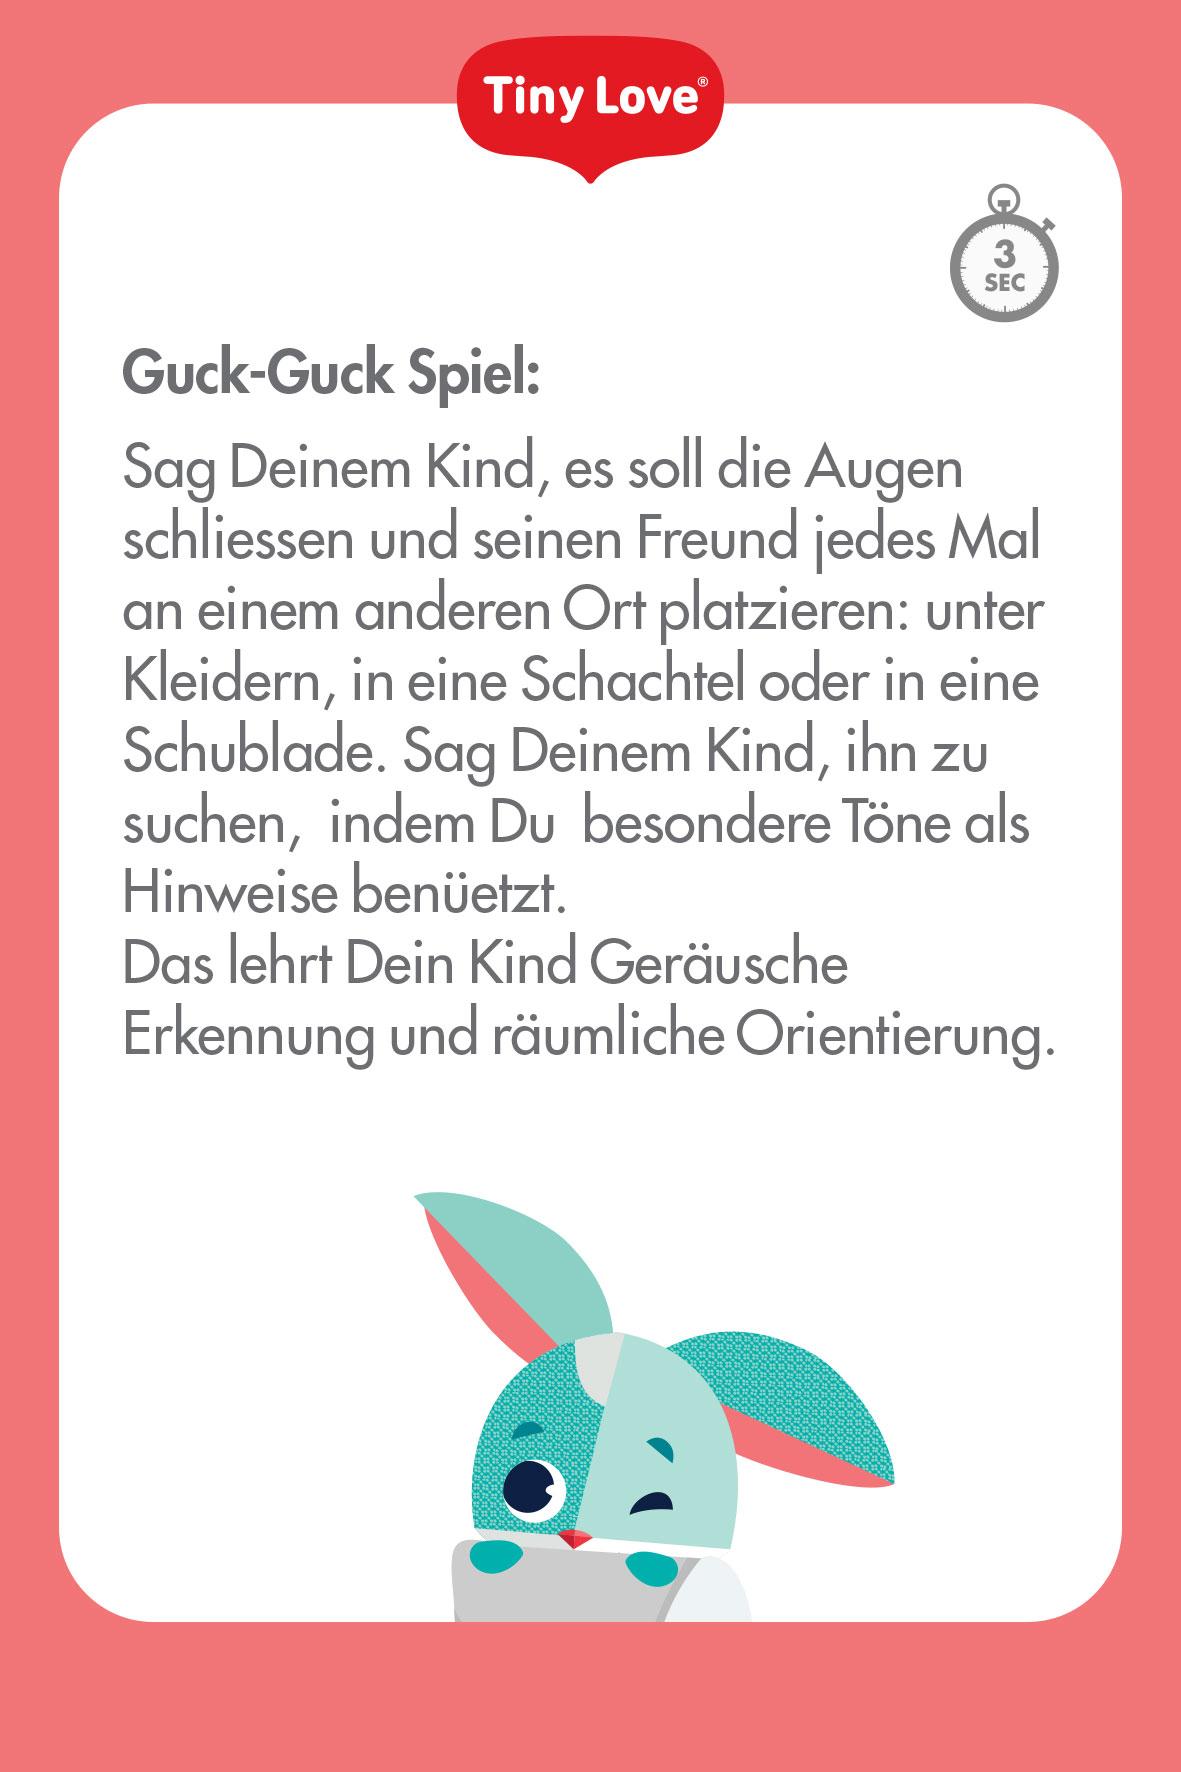 Guck-guck spiel